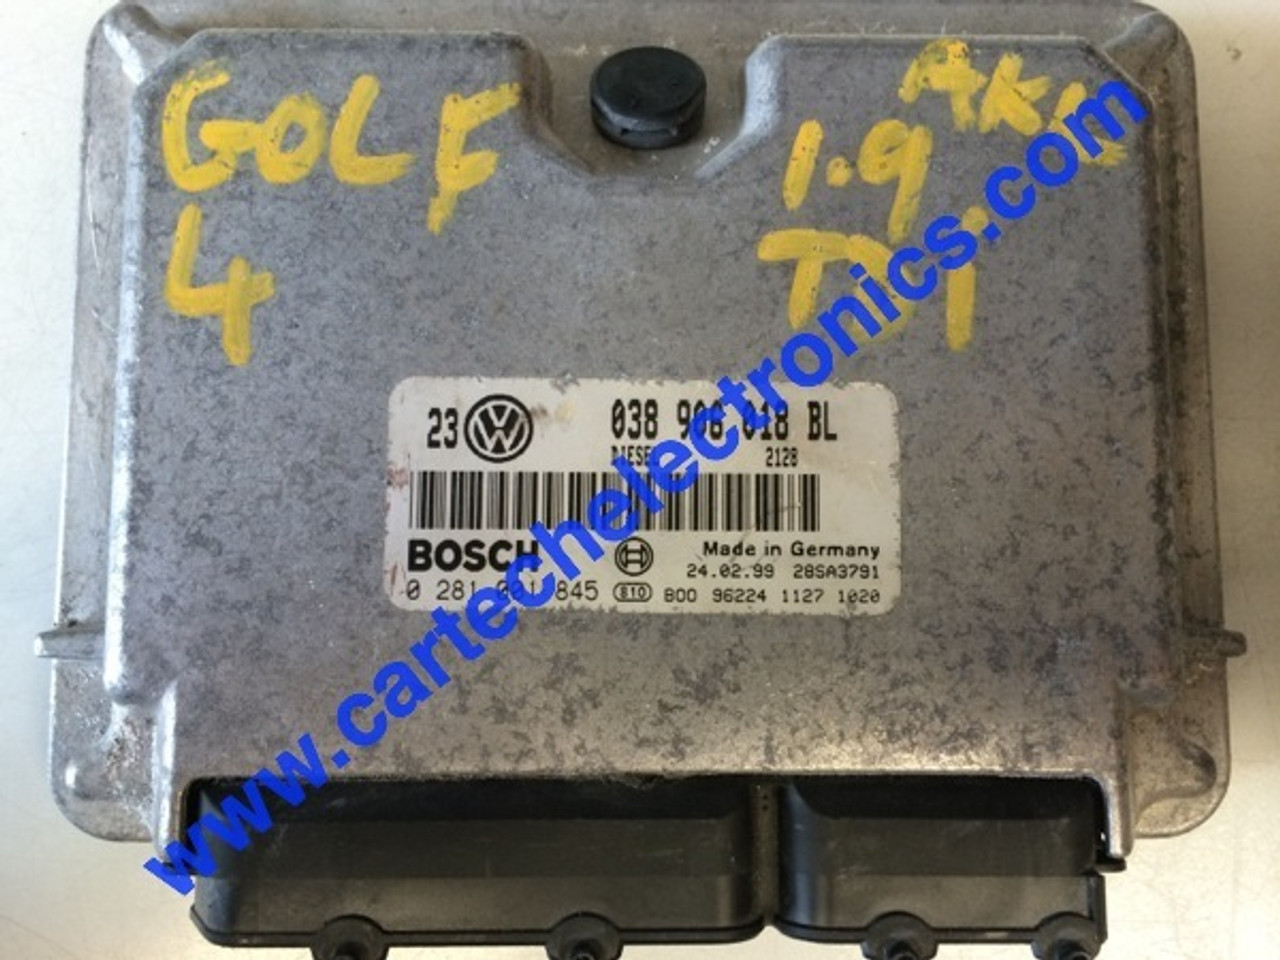 Plug & Play Super Chipped, Tuned Bosch Engine ECU, 0281001845, 0 281 001  845, 038906018BL, 038 906 018 BL